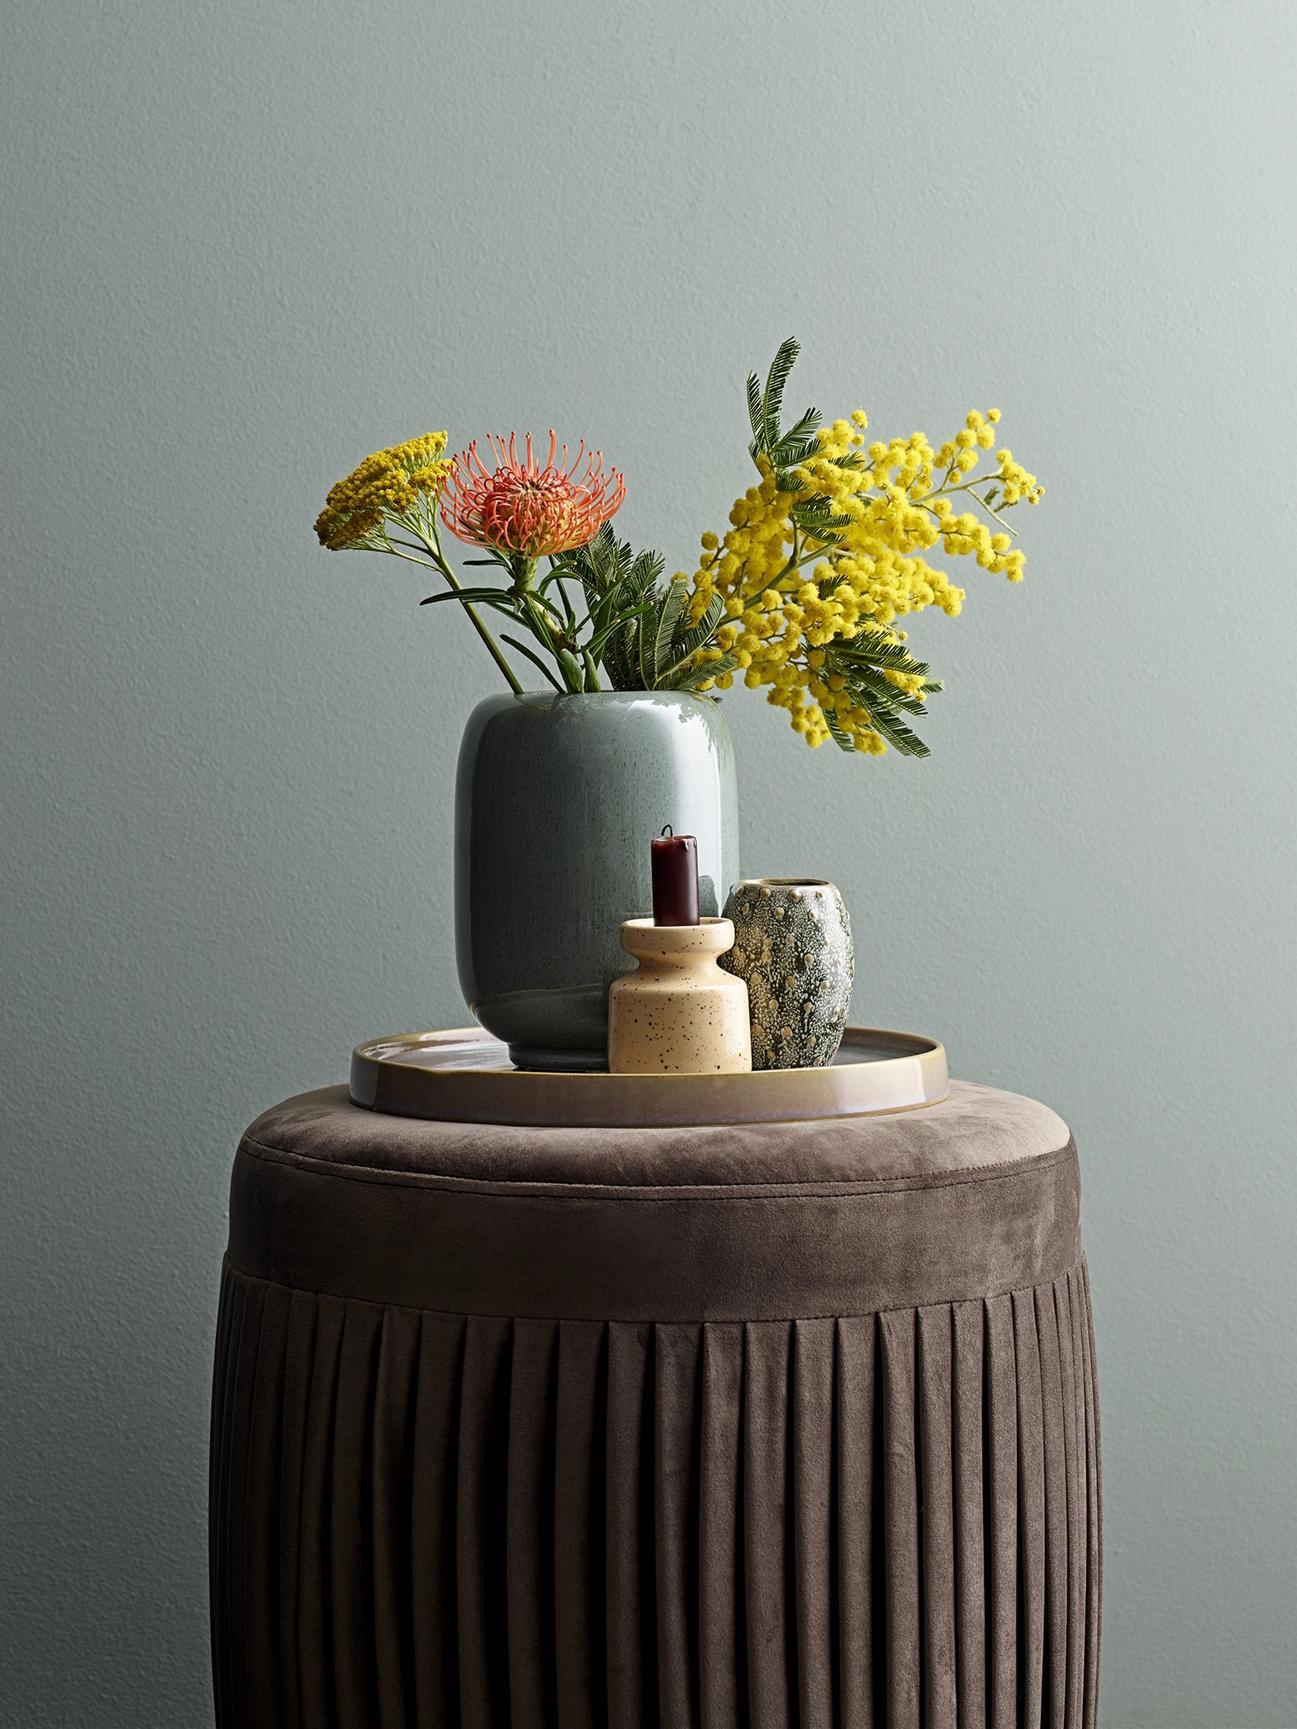 Keramik-Vase Verena, Keramik, Grün, Braun, Ø 14 x H 18 cm